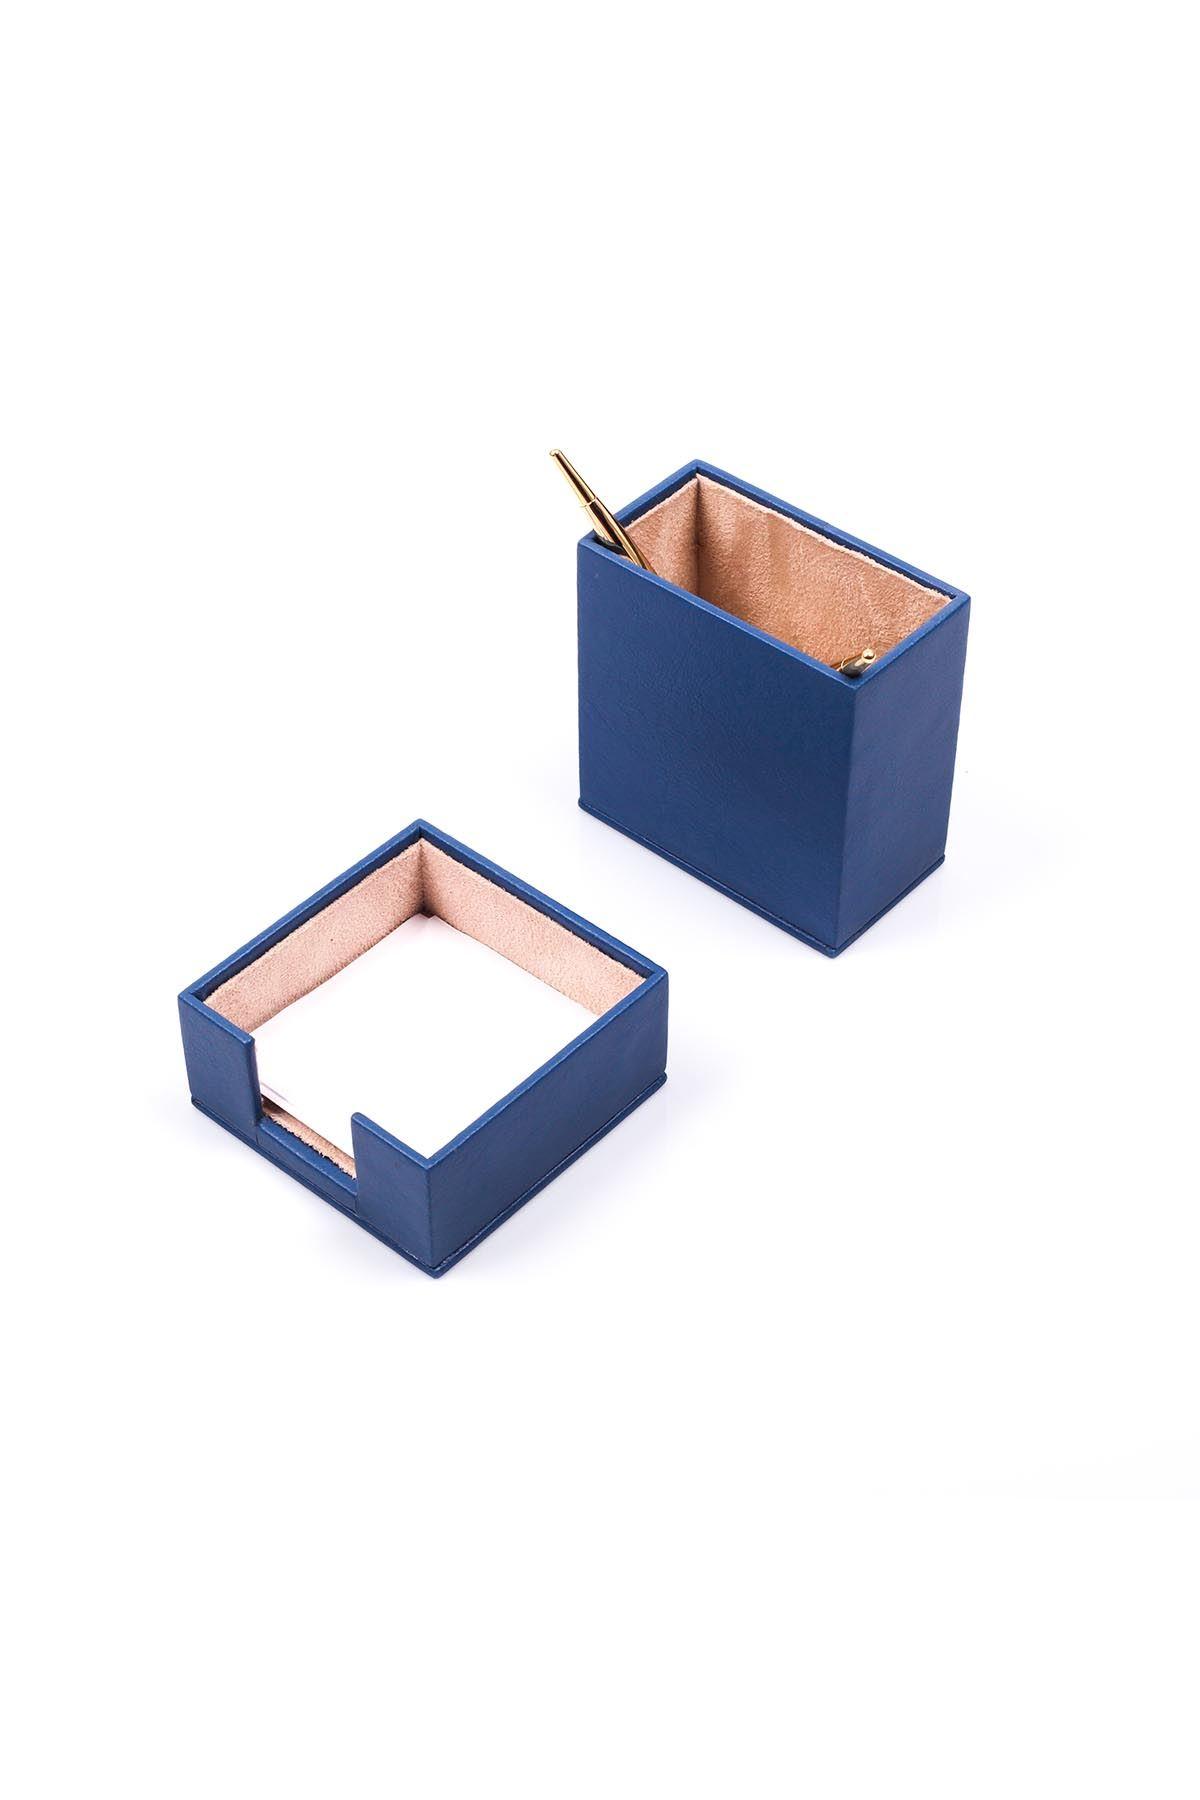 Leather Desk Accessories set of 2 Blue| Desk Set Accessories | Desktop Accessories | Desk Accessories | Desk Organizers | Pencil Holder | Note Paper Holder